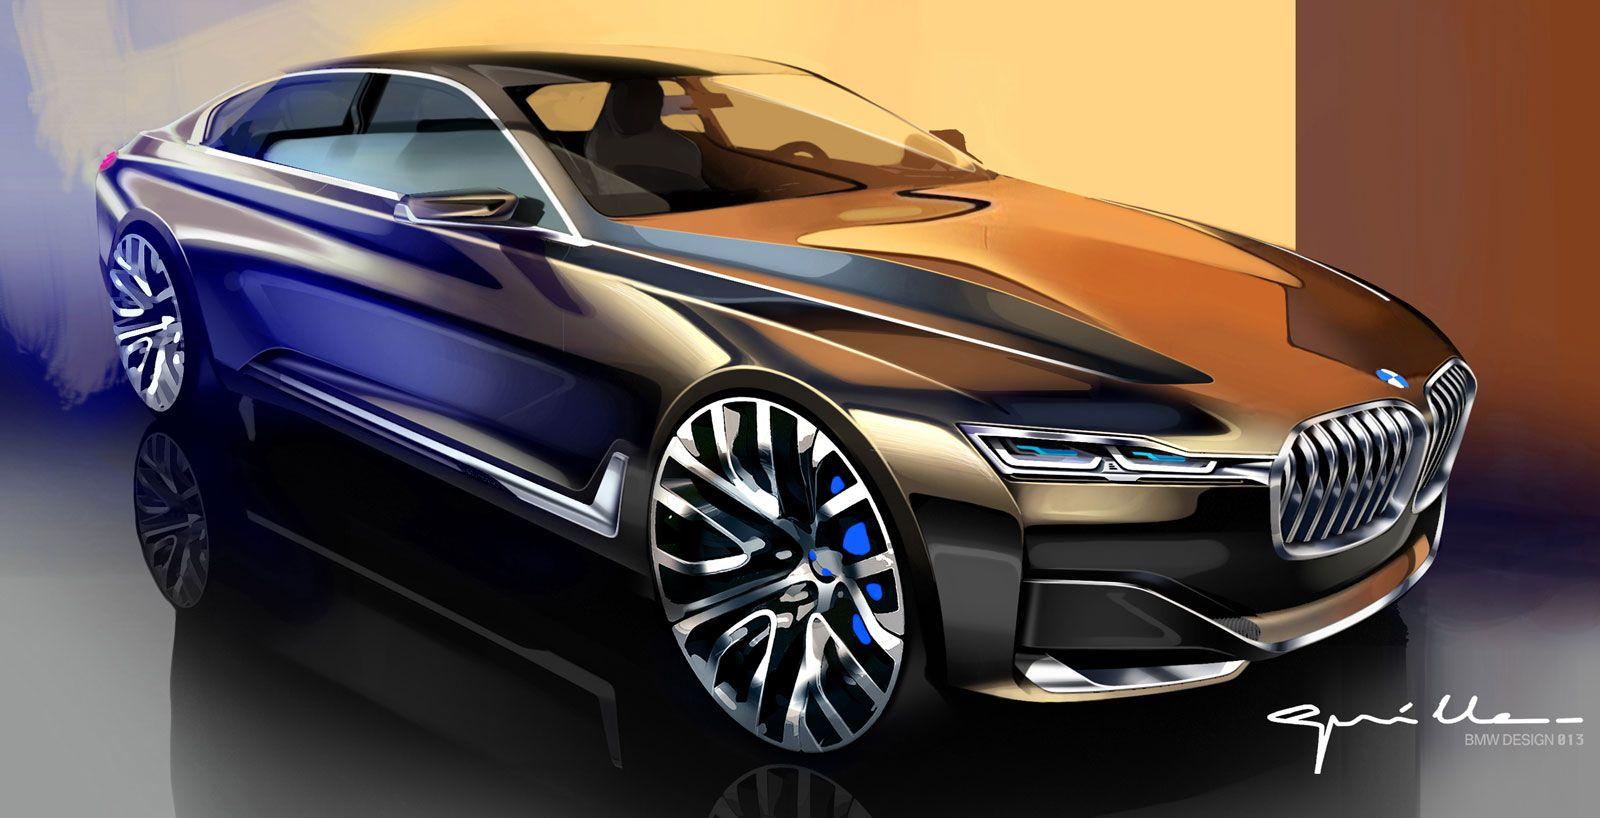 Future Concept Car Design Bmw Vision Future Luxury Concept Design Sketch By Nicolas Guille Bmw Concept Car Bmw Concept Bmw Design